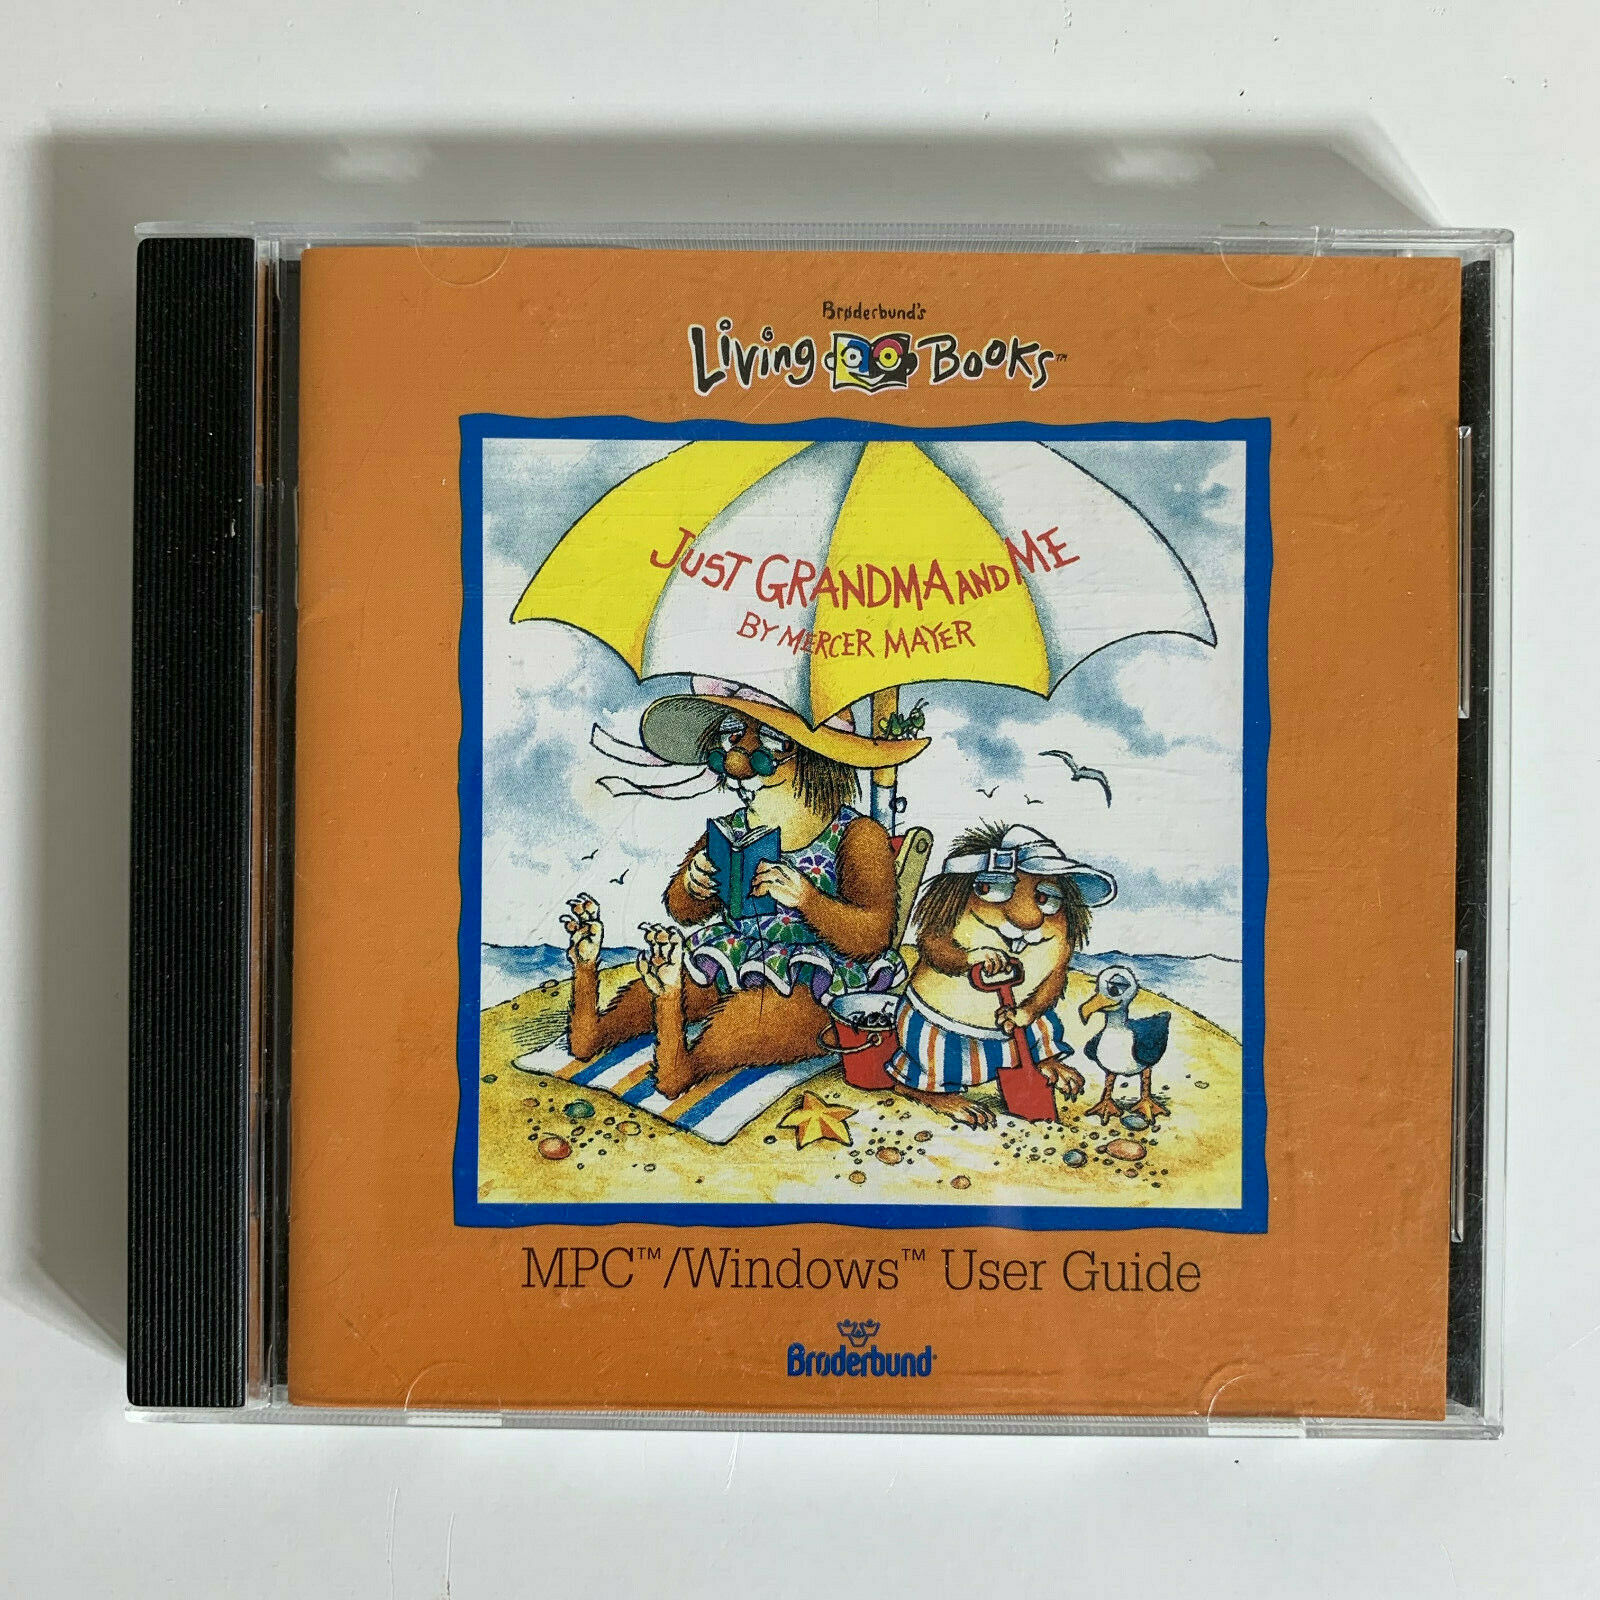 Just Grandma and Me (1992 PC Game)